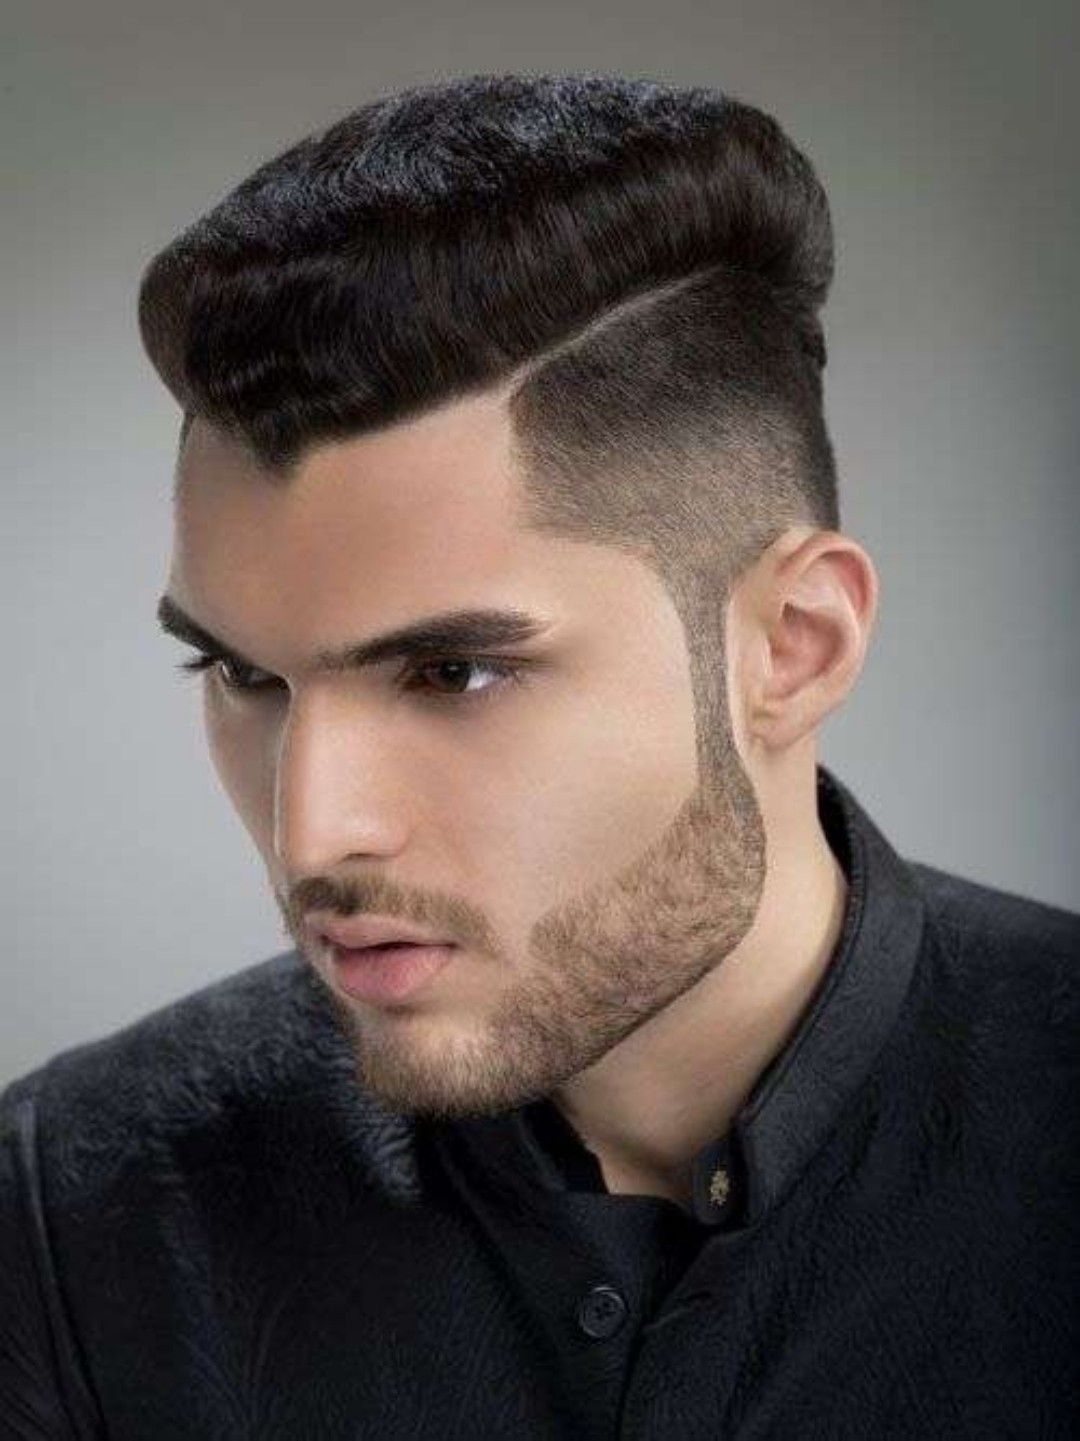 20+ Fade haircut indian ideas in 2021